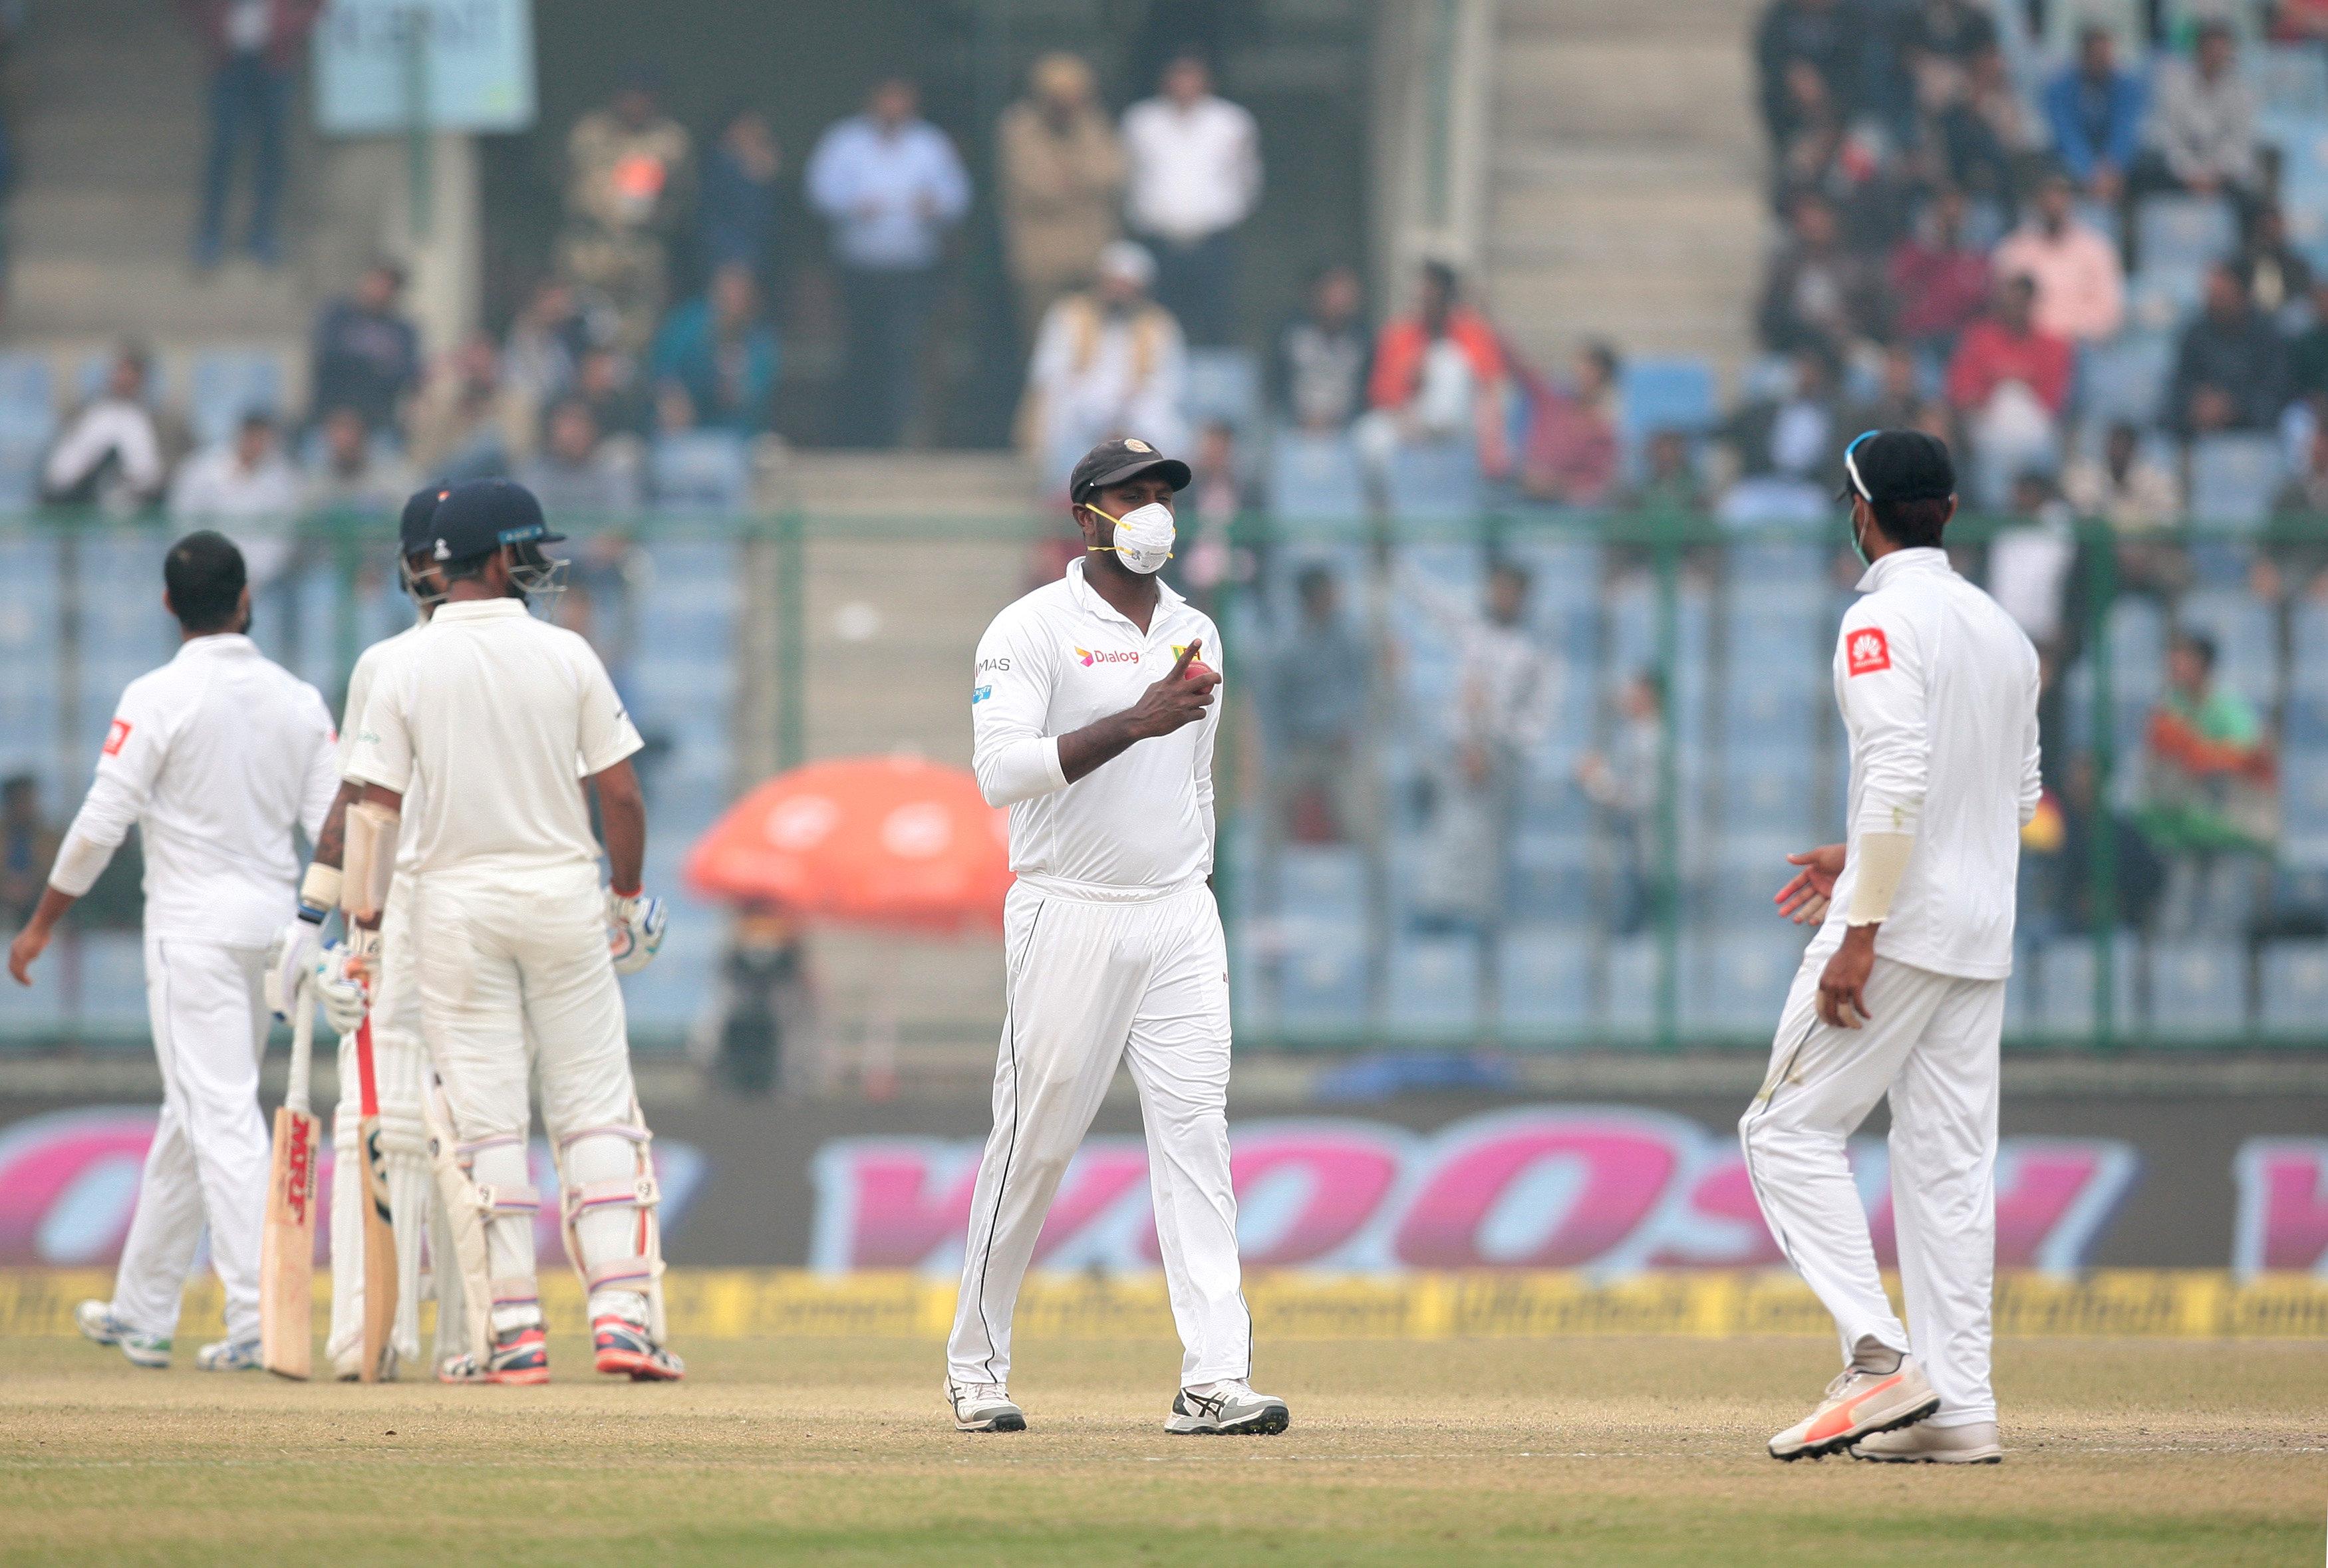 Delhi smog causes Sri Lanka players to vomit on field